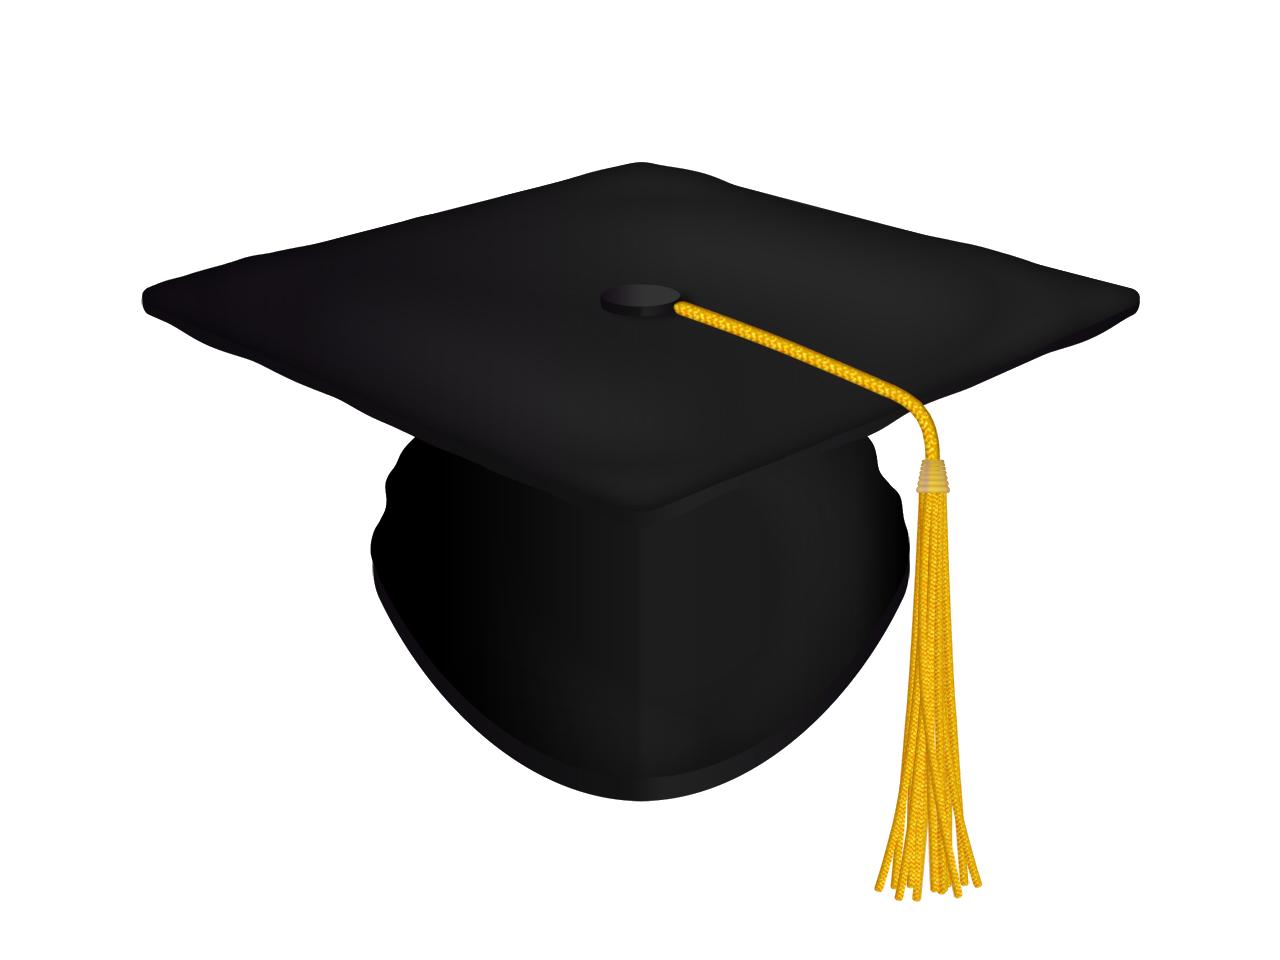 Diploma clipart transparent background. Hat black vector art